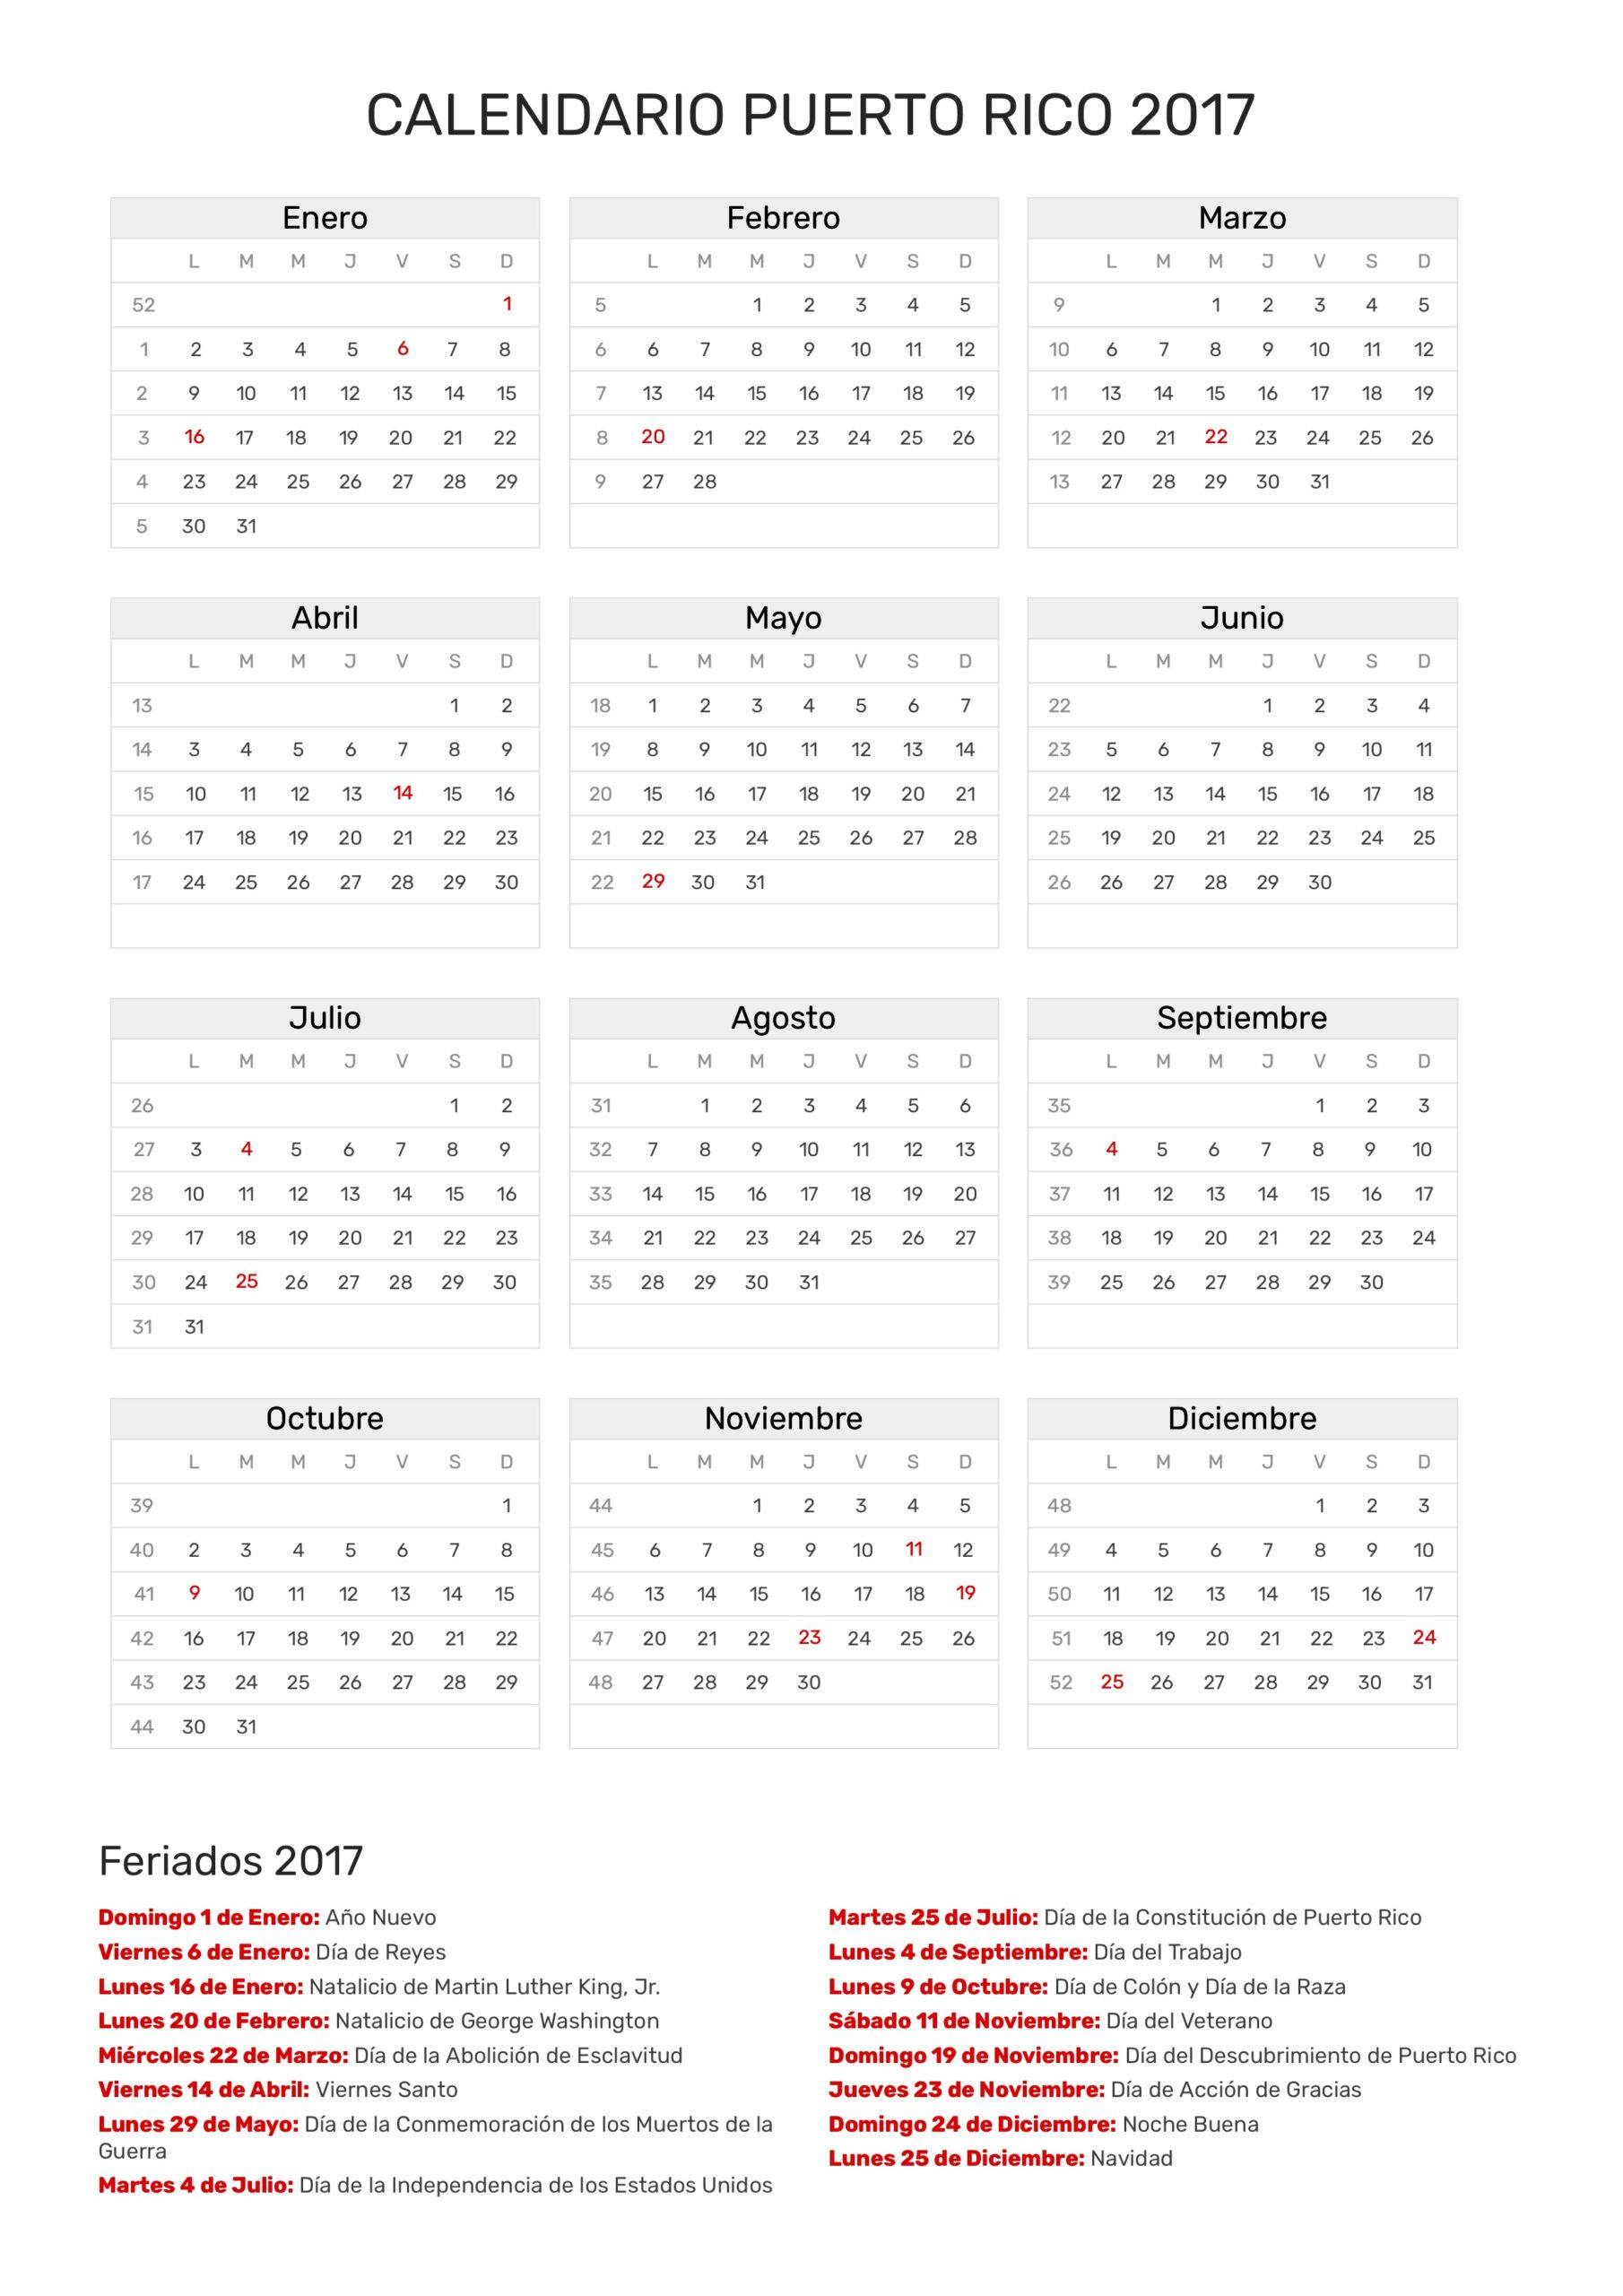 Calendario De Puerto Rico Año 2017 | Feriados | Feriados regarding Lunar Calendar Puerto Rico